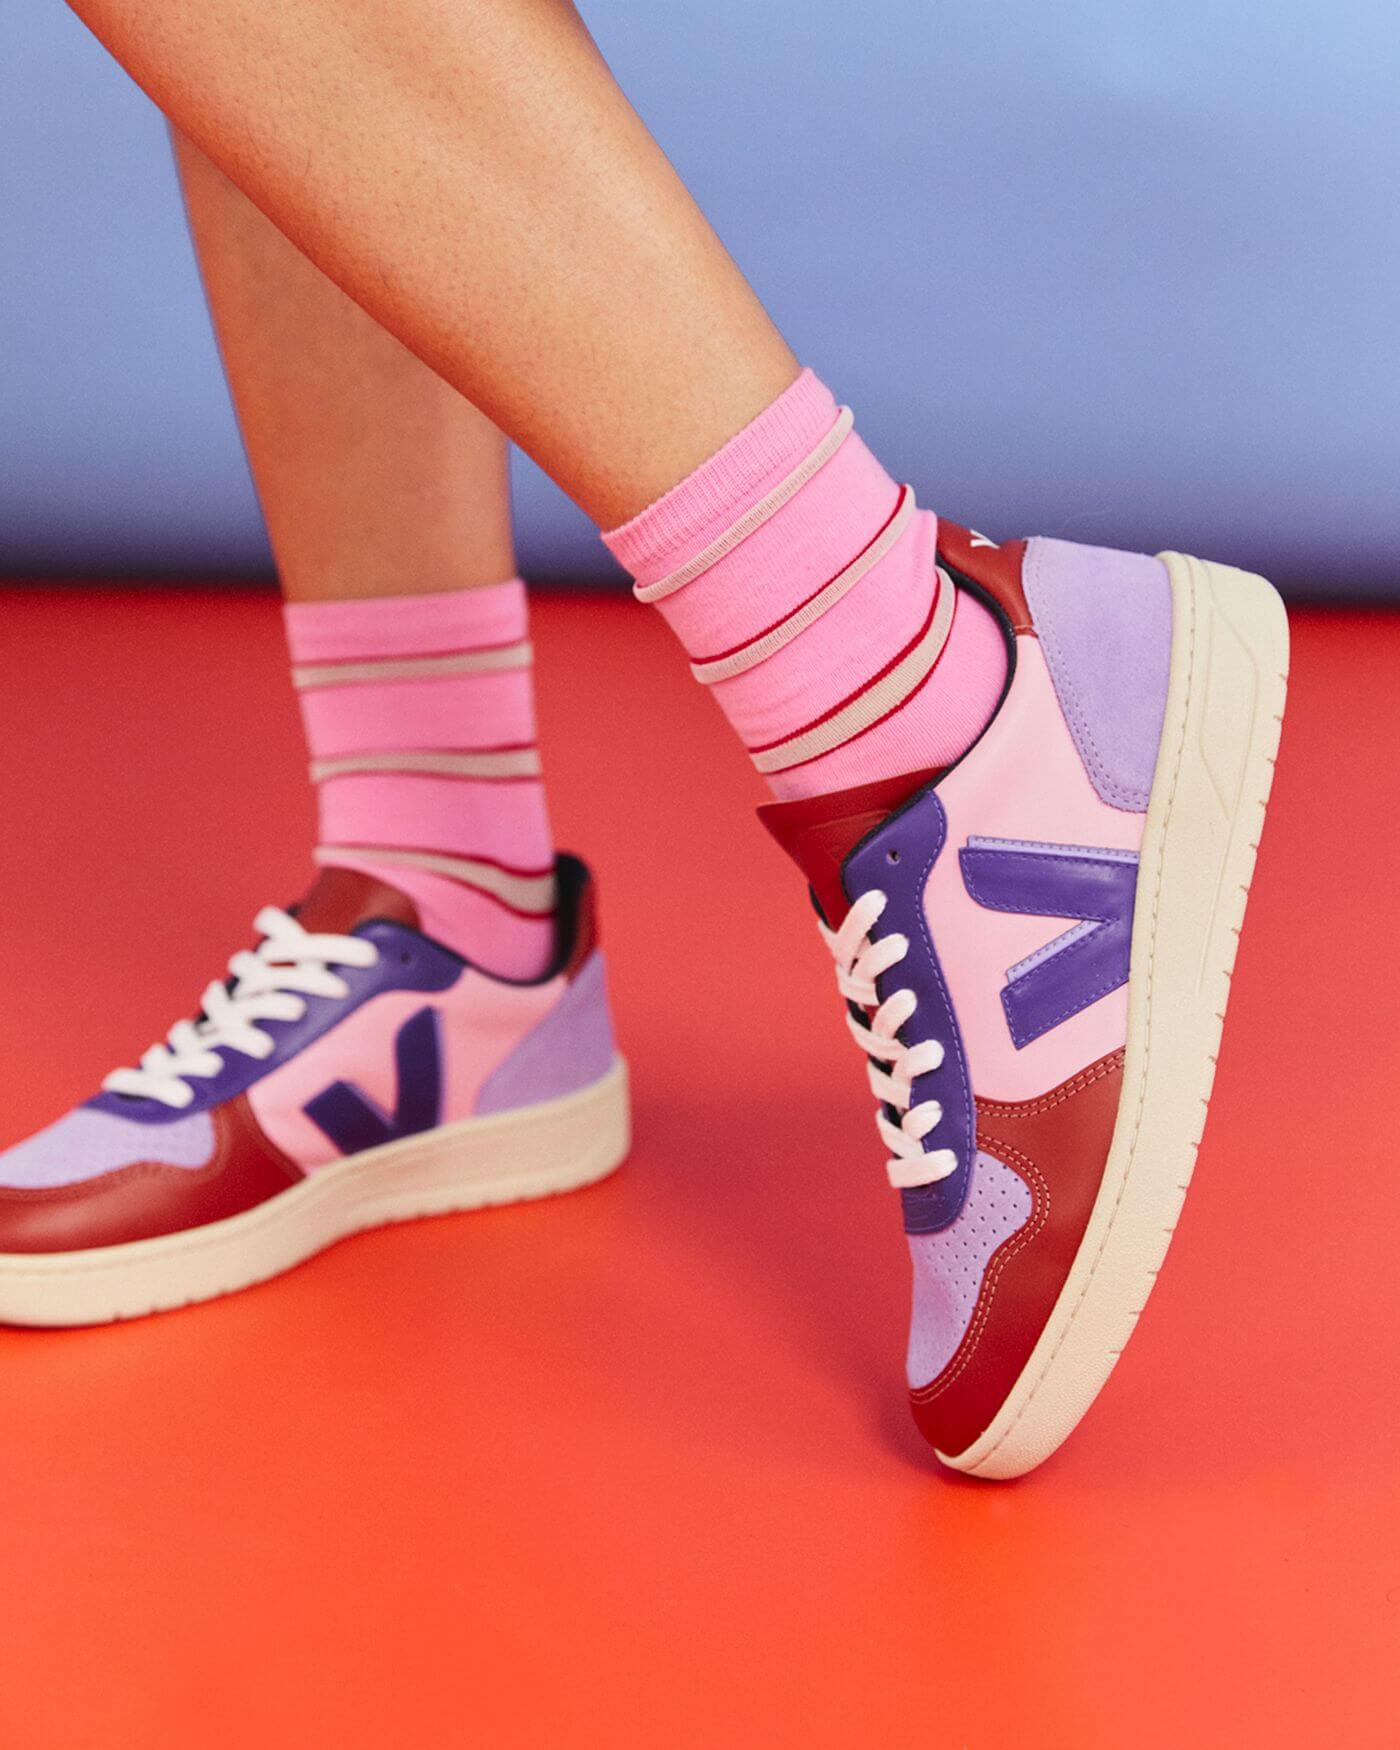 on feet - VEJAx Make My Lemonade - V-10 - Guimauve - VV022757